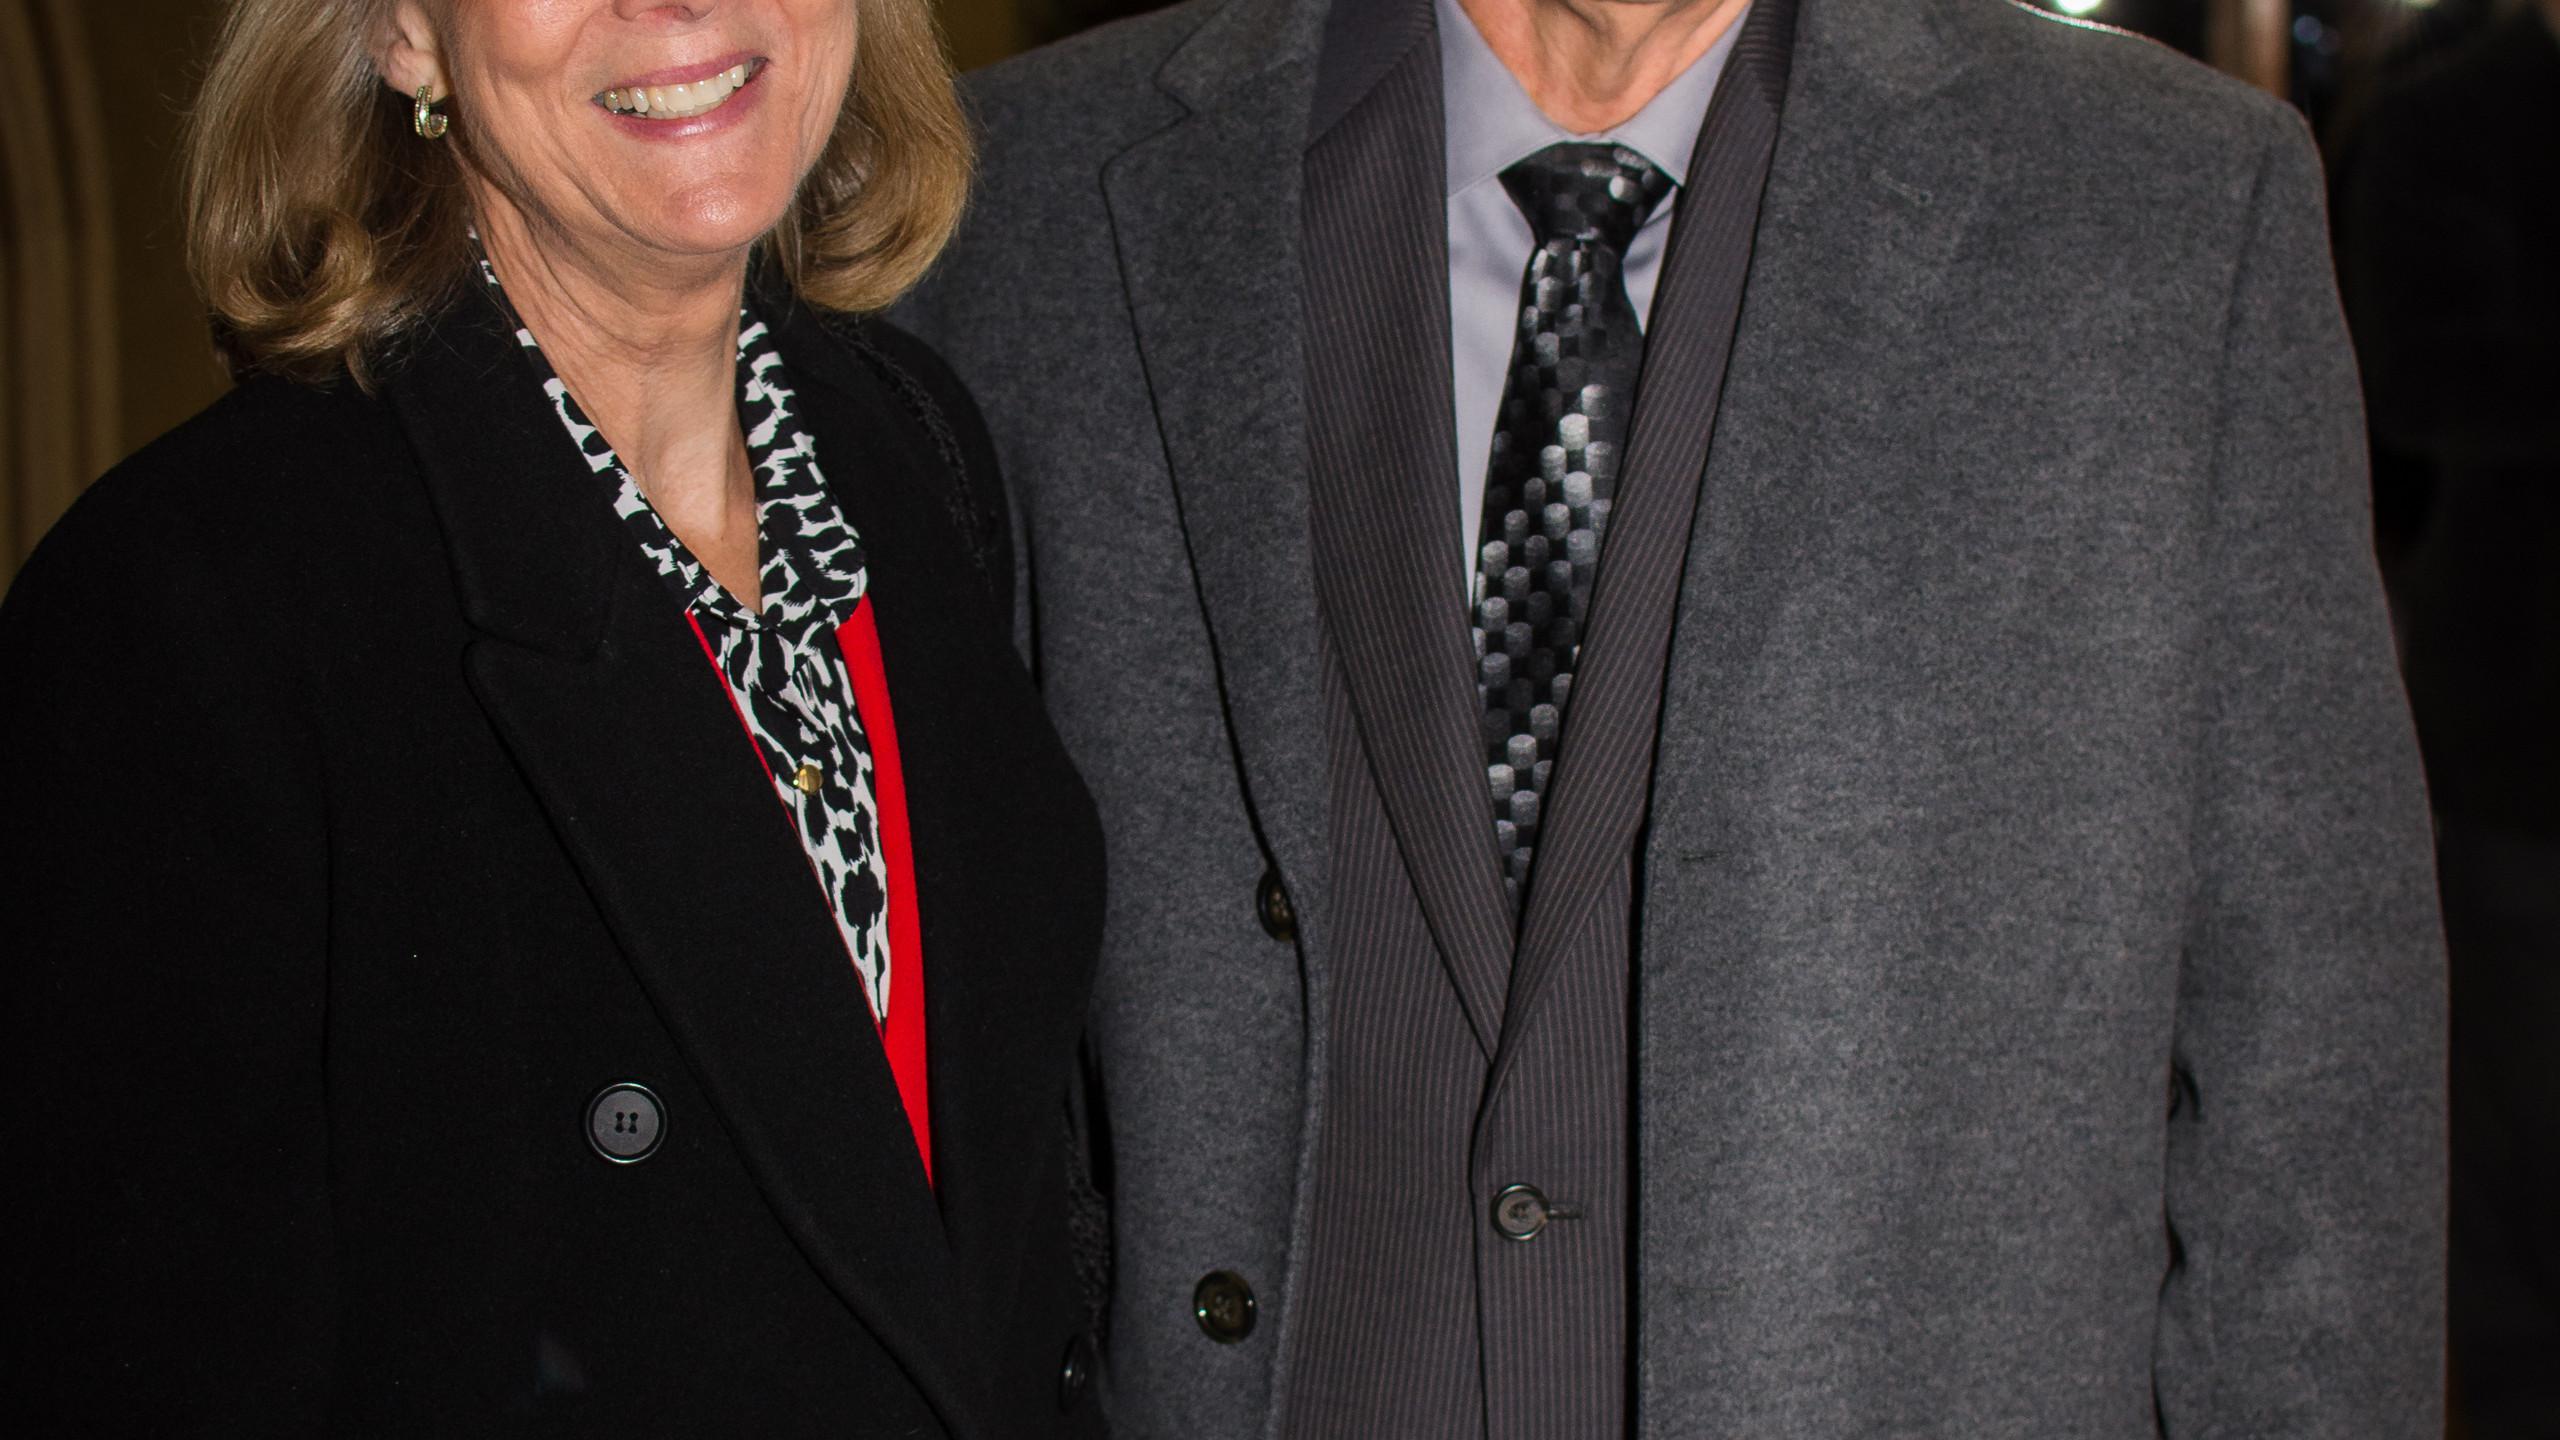 Charles Hood and Diana Simmons